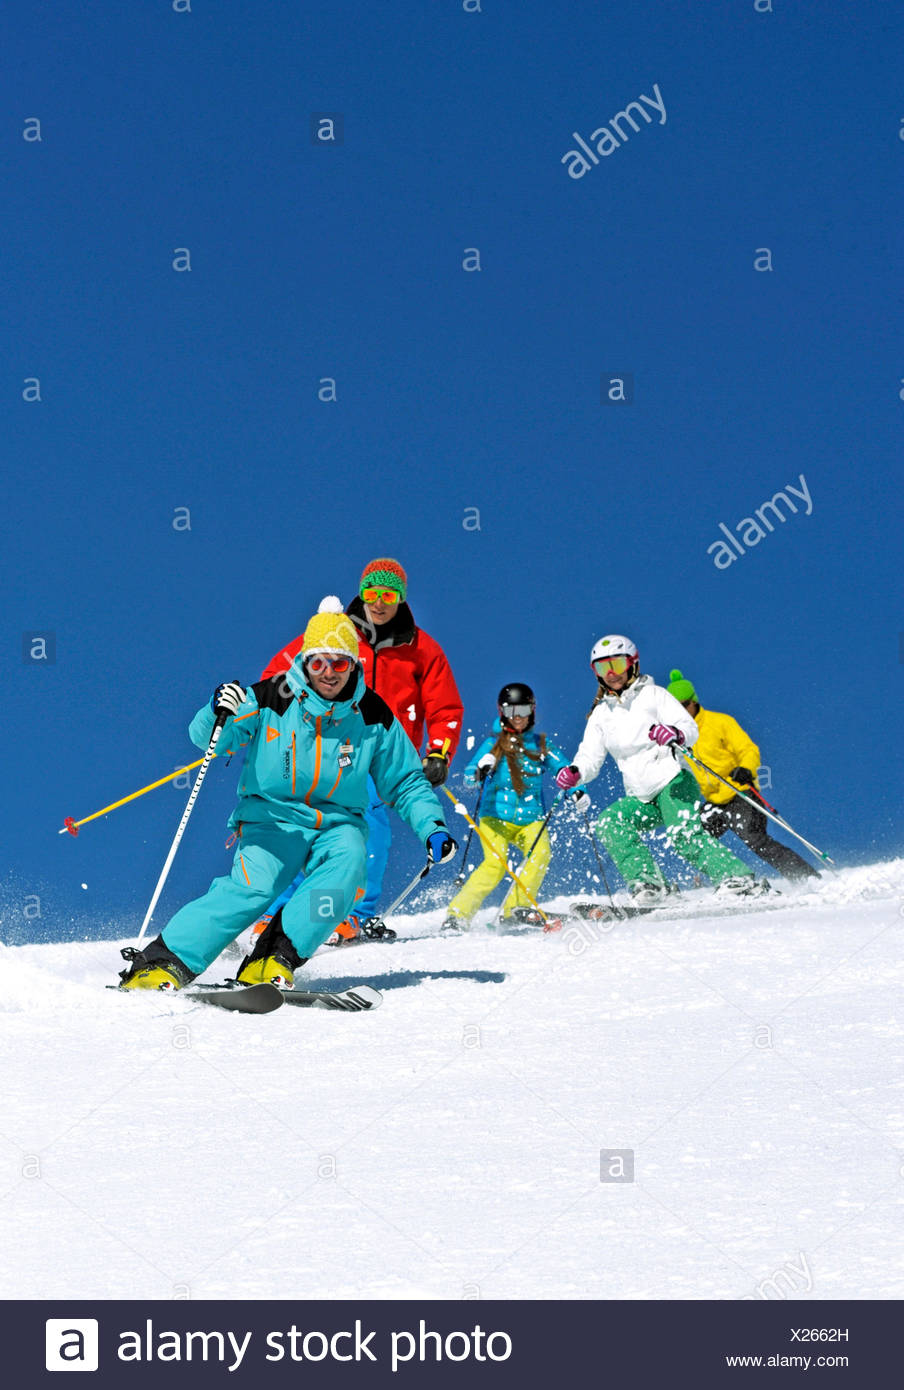 skiers having a fantastic ski-run, France, Savoie, La Plagne - Stock Image